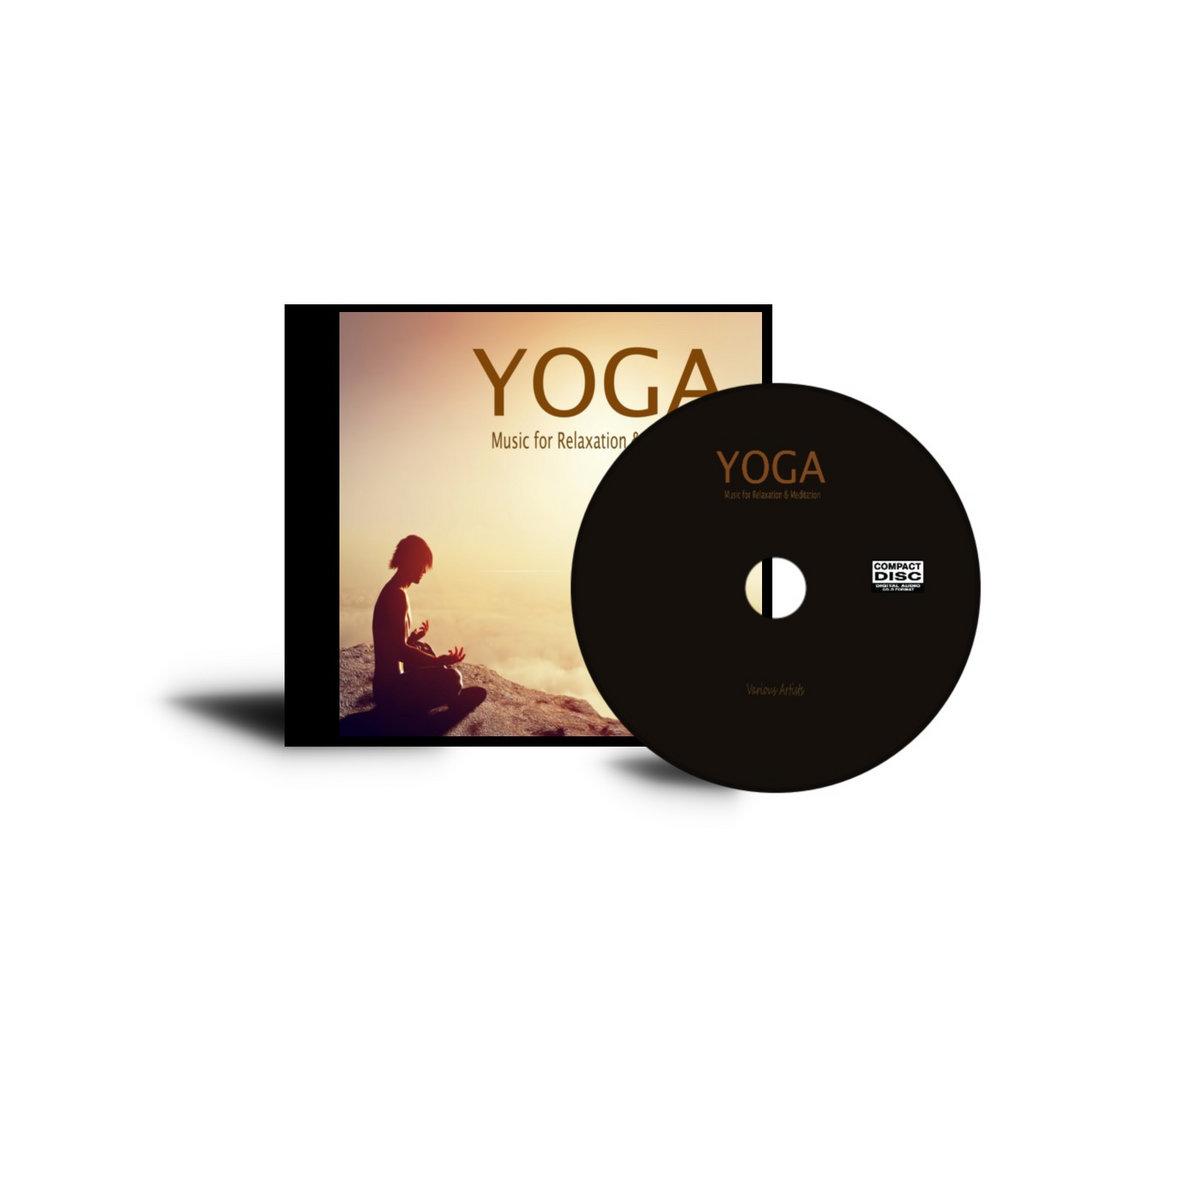 Yoga Music For Relaxation Meditation Relaxation Meditation Music